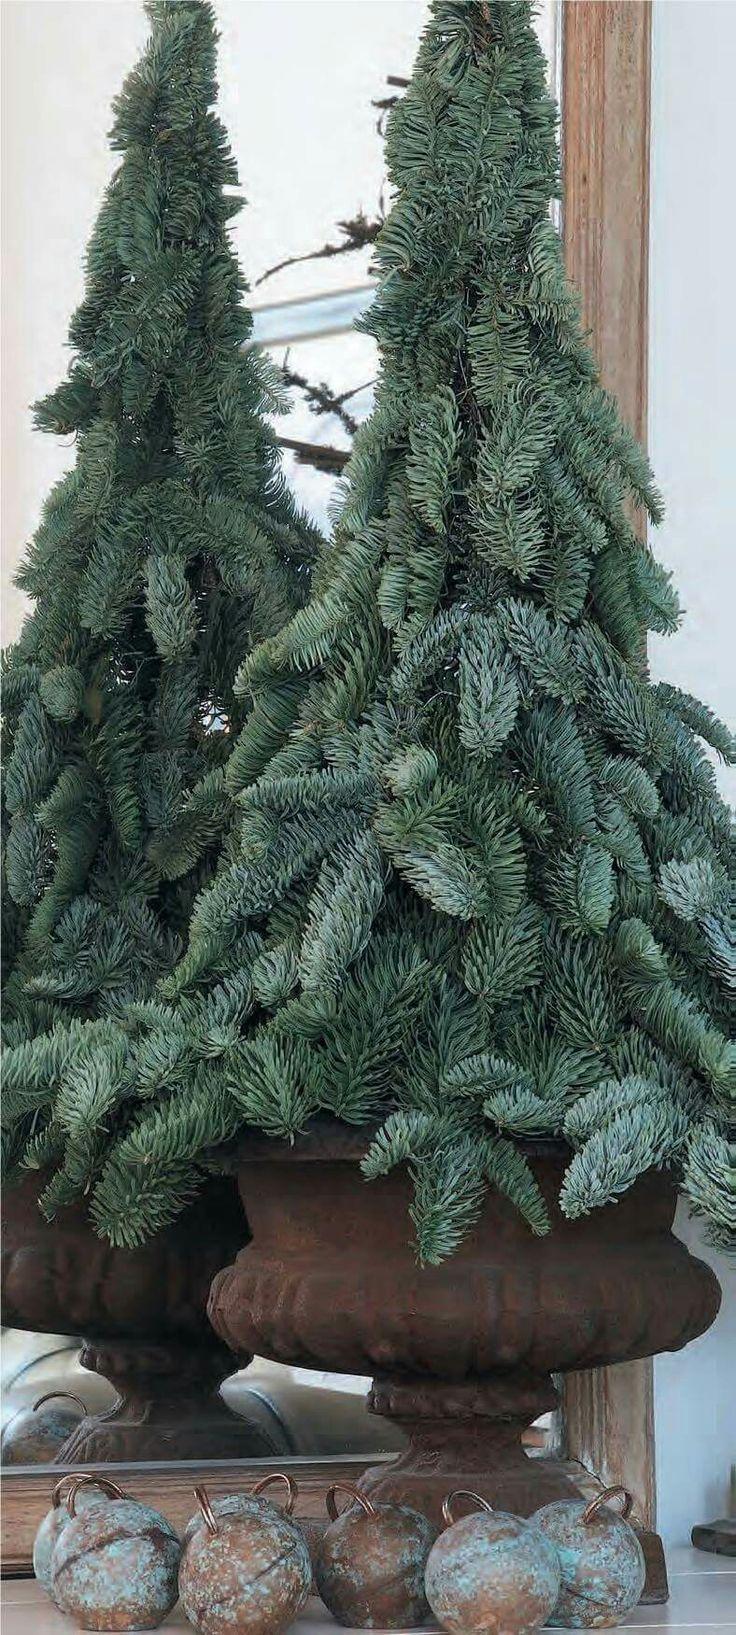 Christmas tree by Antonella Rossi